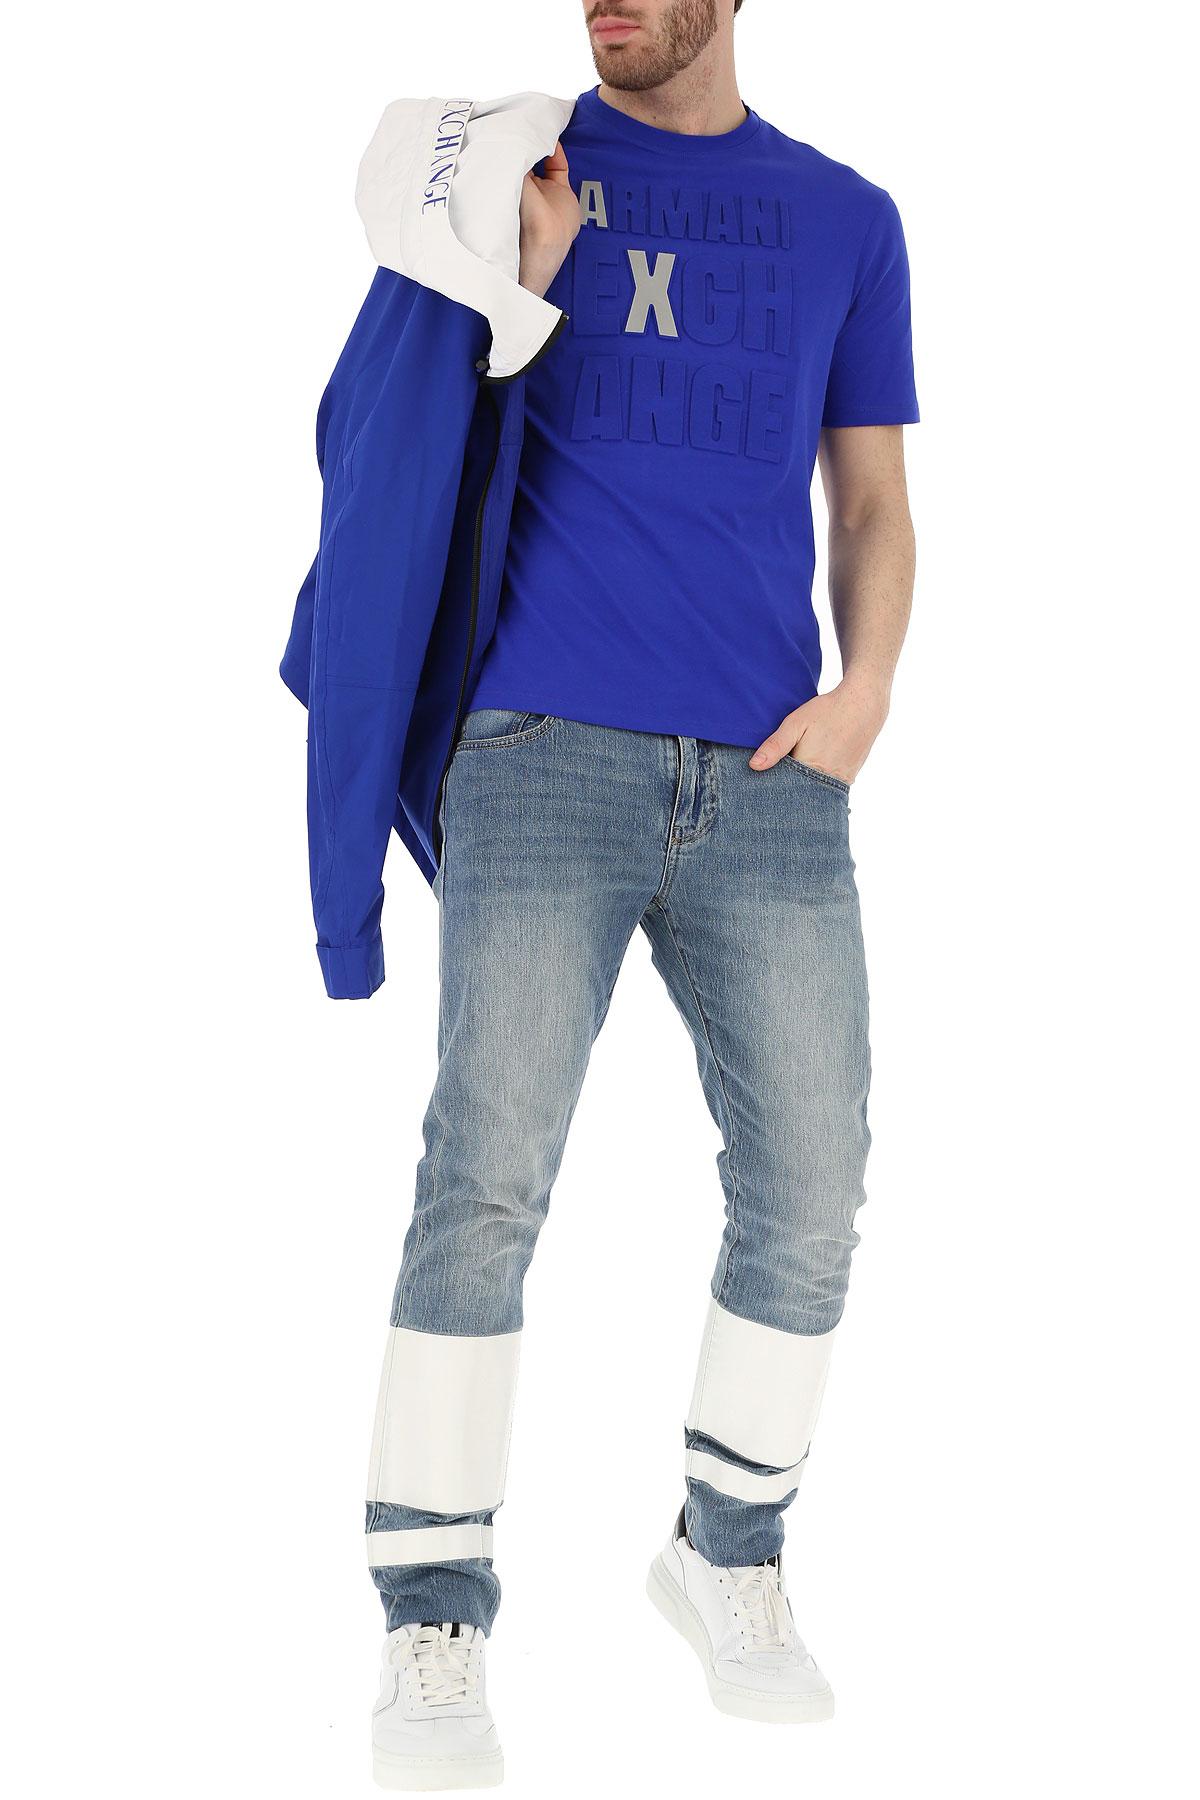 Emporio nbsp; Hombres Cobalto Primavera 2019 Ropa verano Azul Para Armani ZFP7qrZ